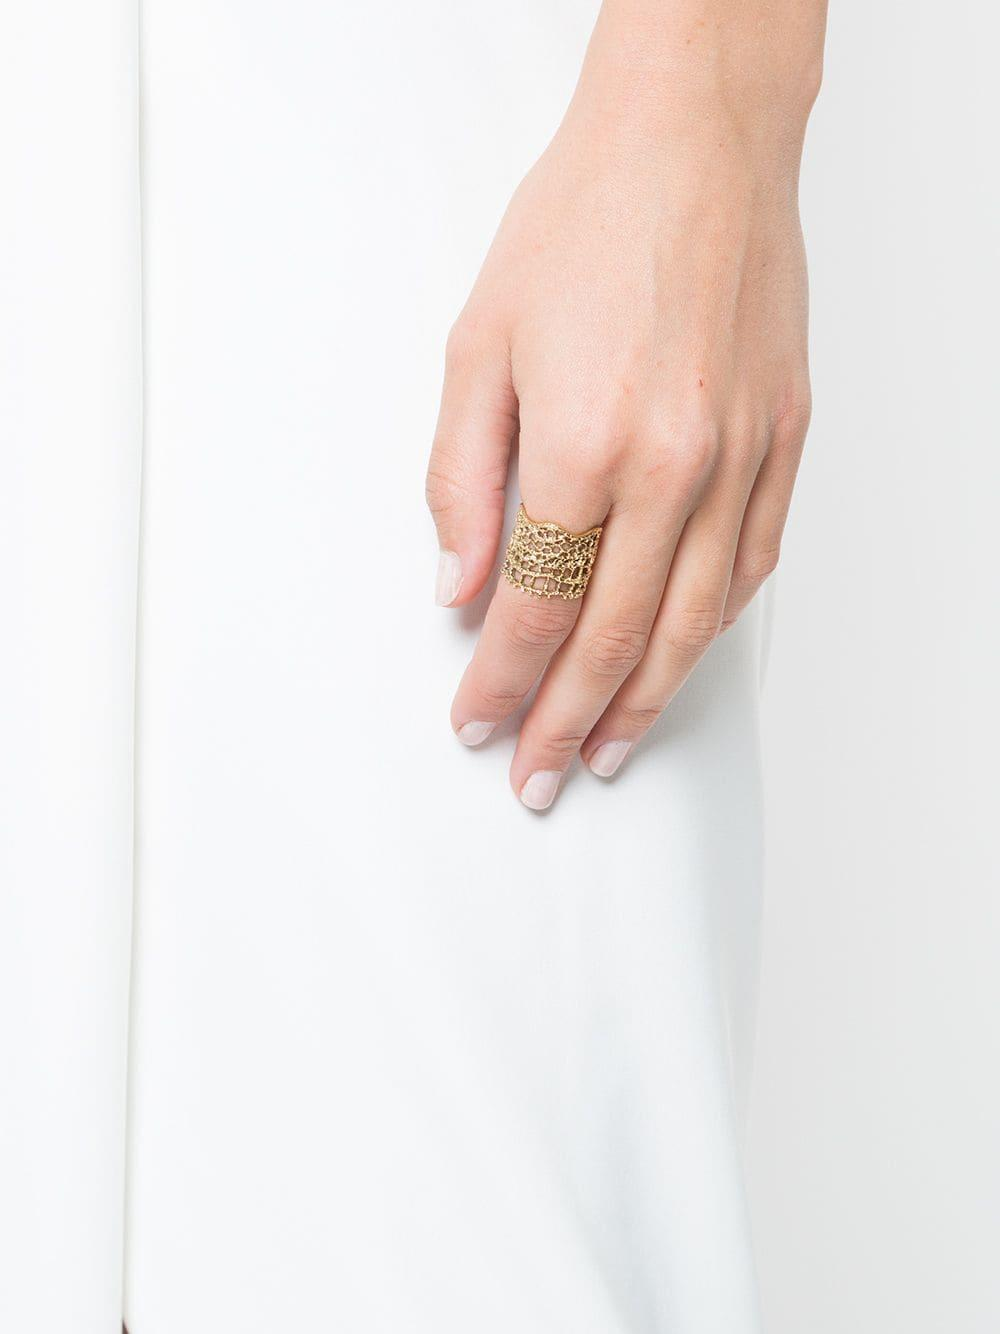 Aurelie Bidermann Dentelle Bague Ring - Save 49%